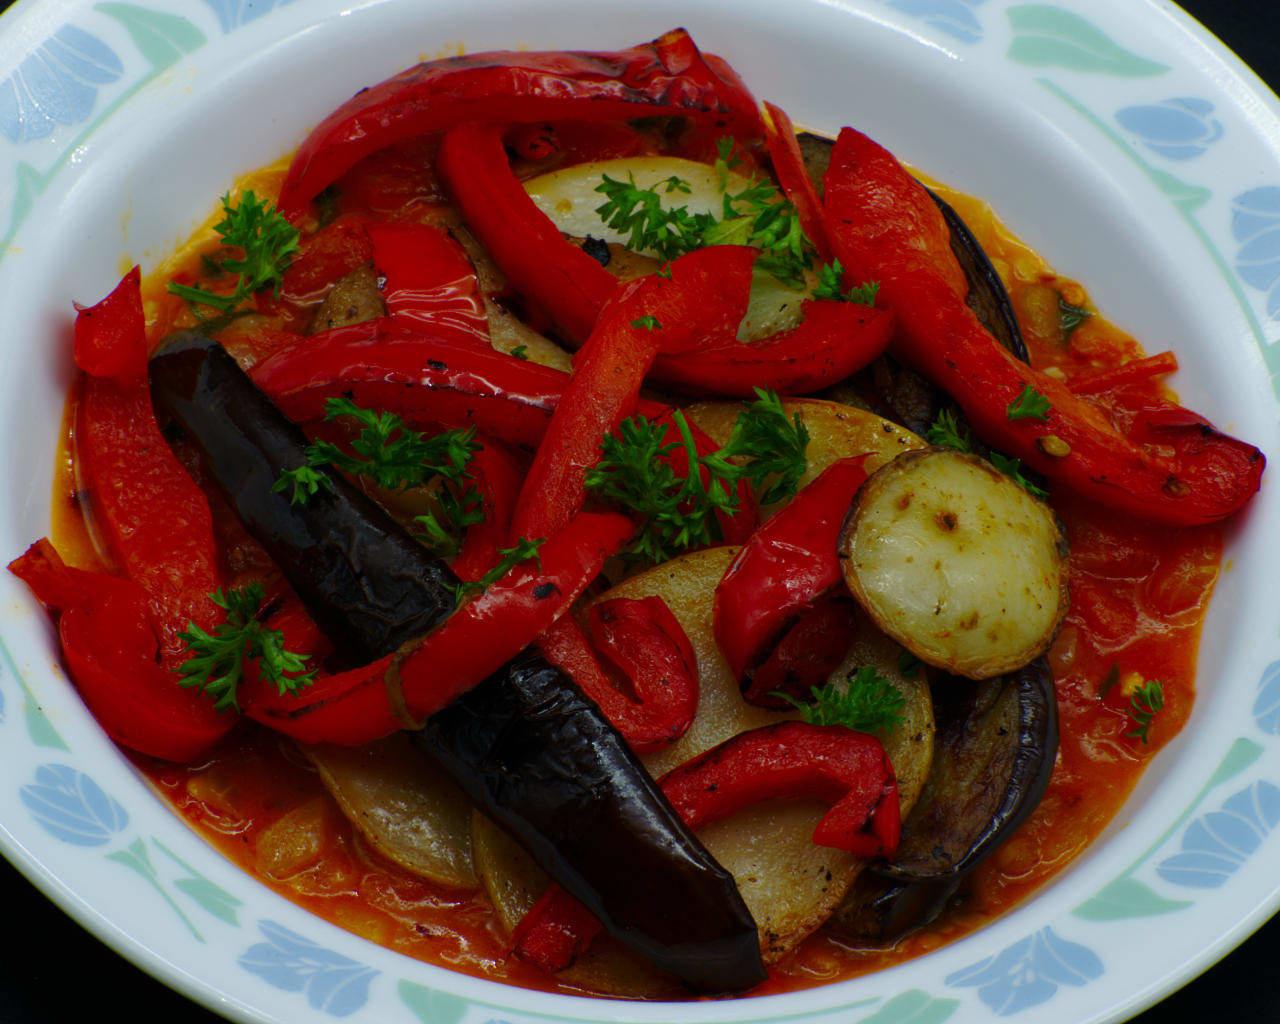 Tomato Eggplant Saksuka Image